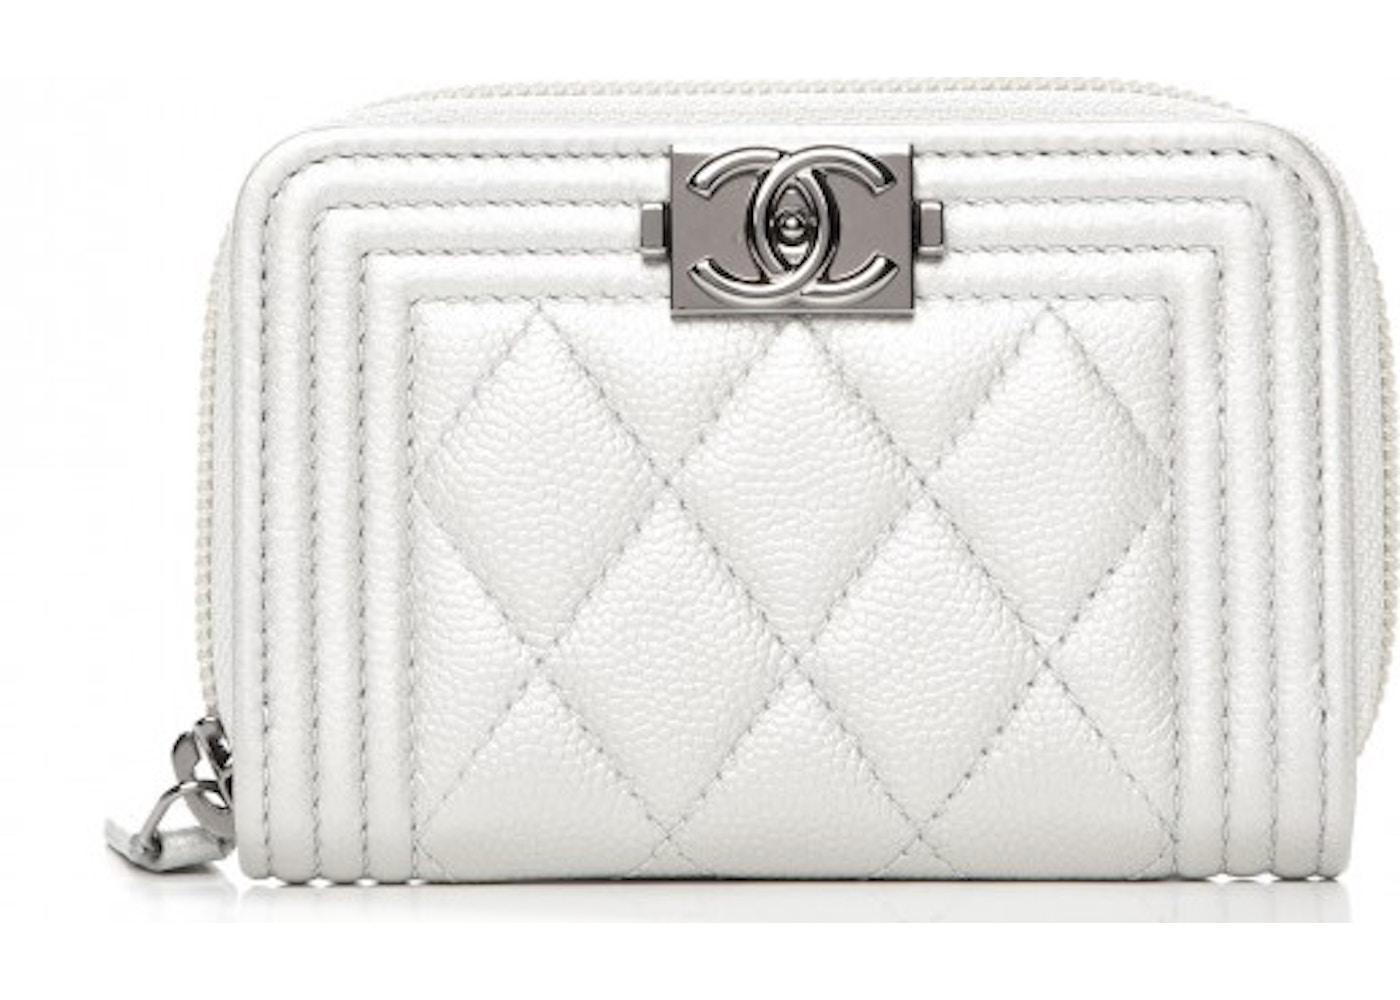 b6a7132083a1bf Chanel Boy Zip Around Coin Purse Wallet Quilted Diamond White. Quilted  Diamond White